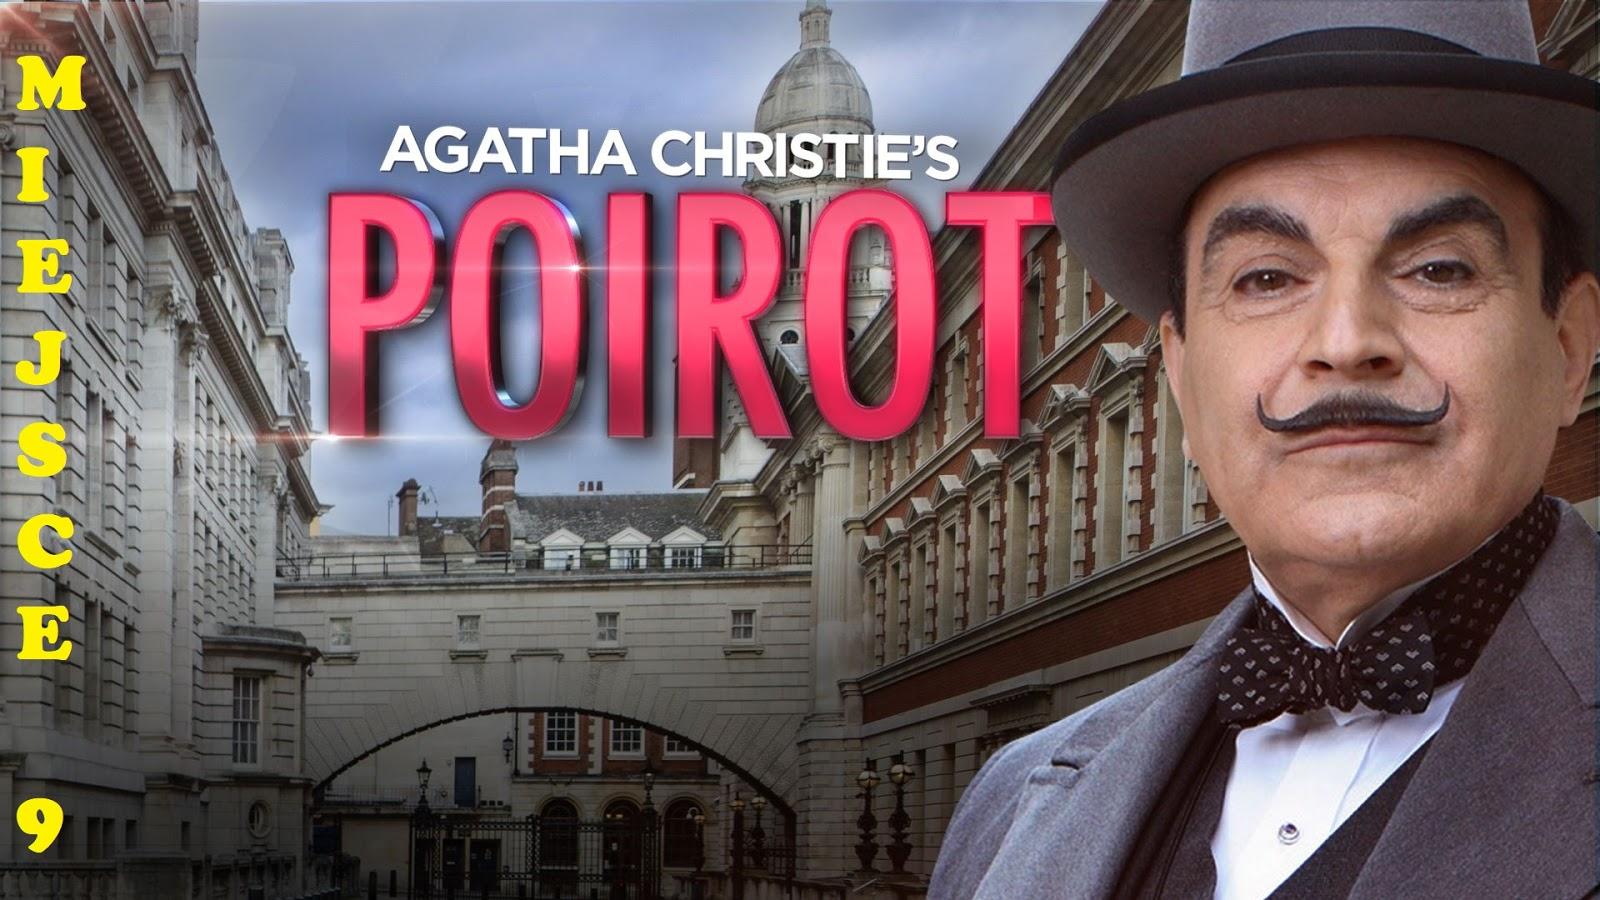 Poirot - seriale top 10